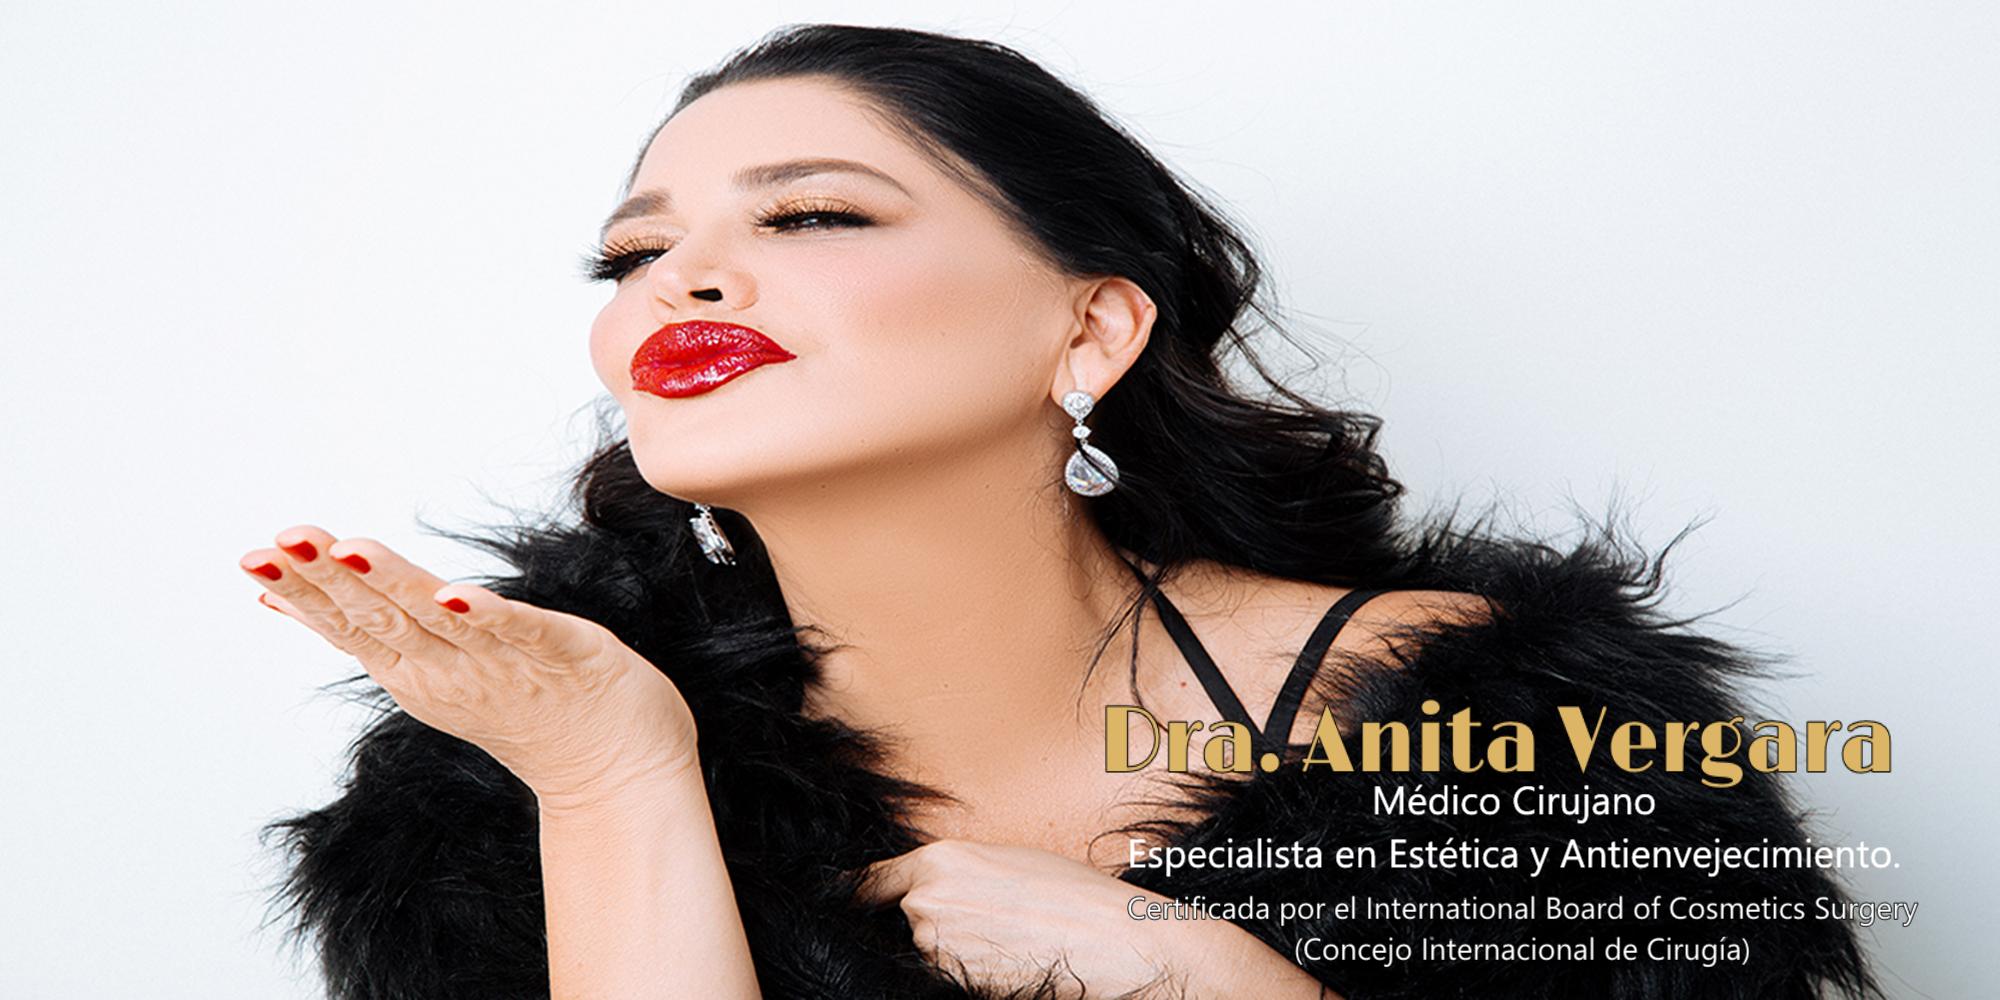 ANITA VERGARA: La Belleza Infinita detrás de La Belleza Infinita